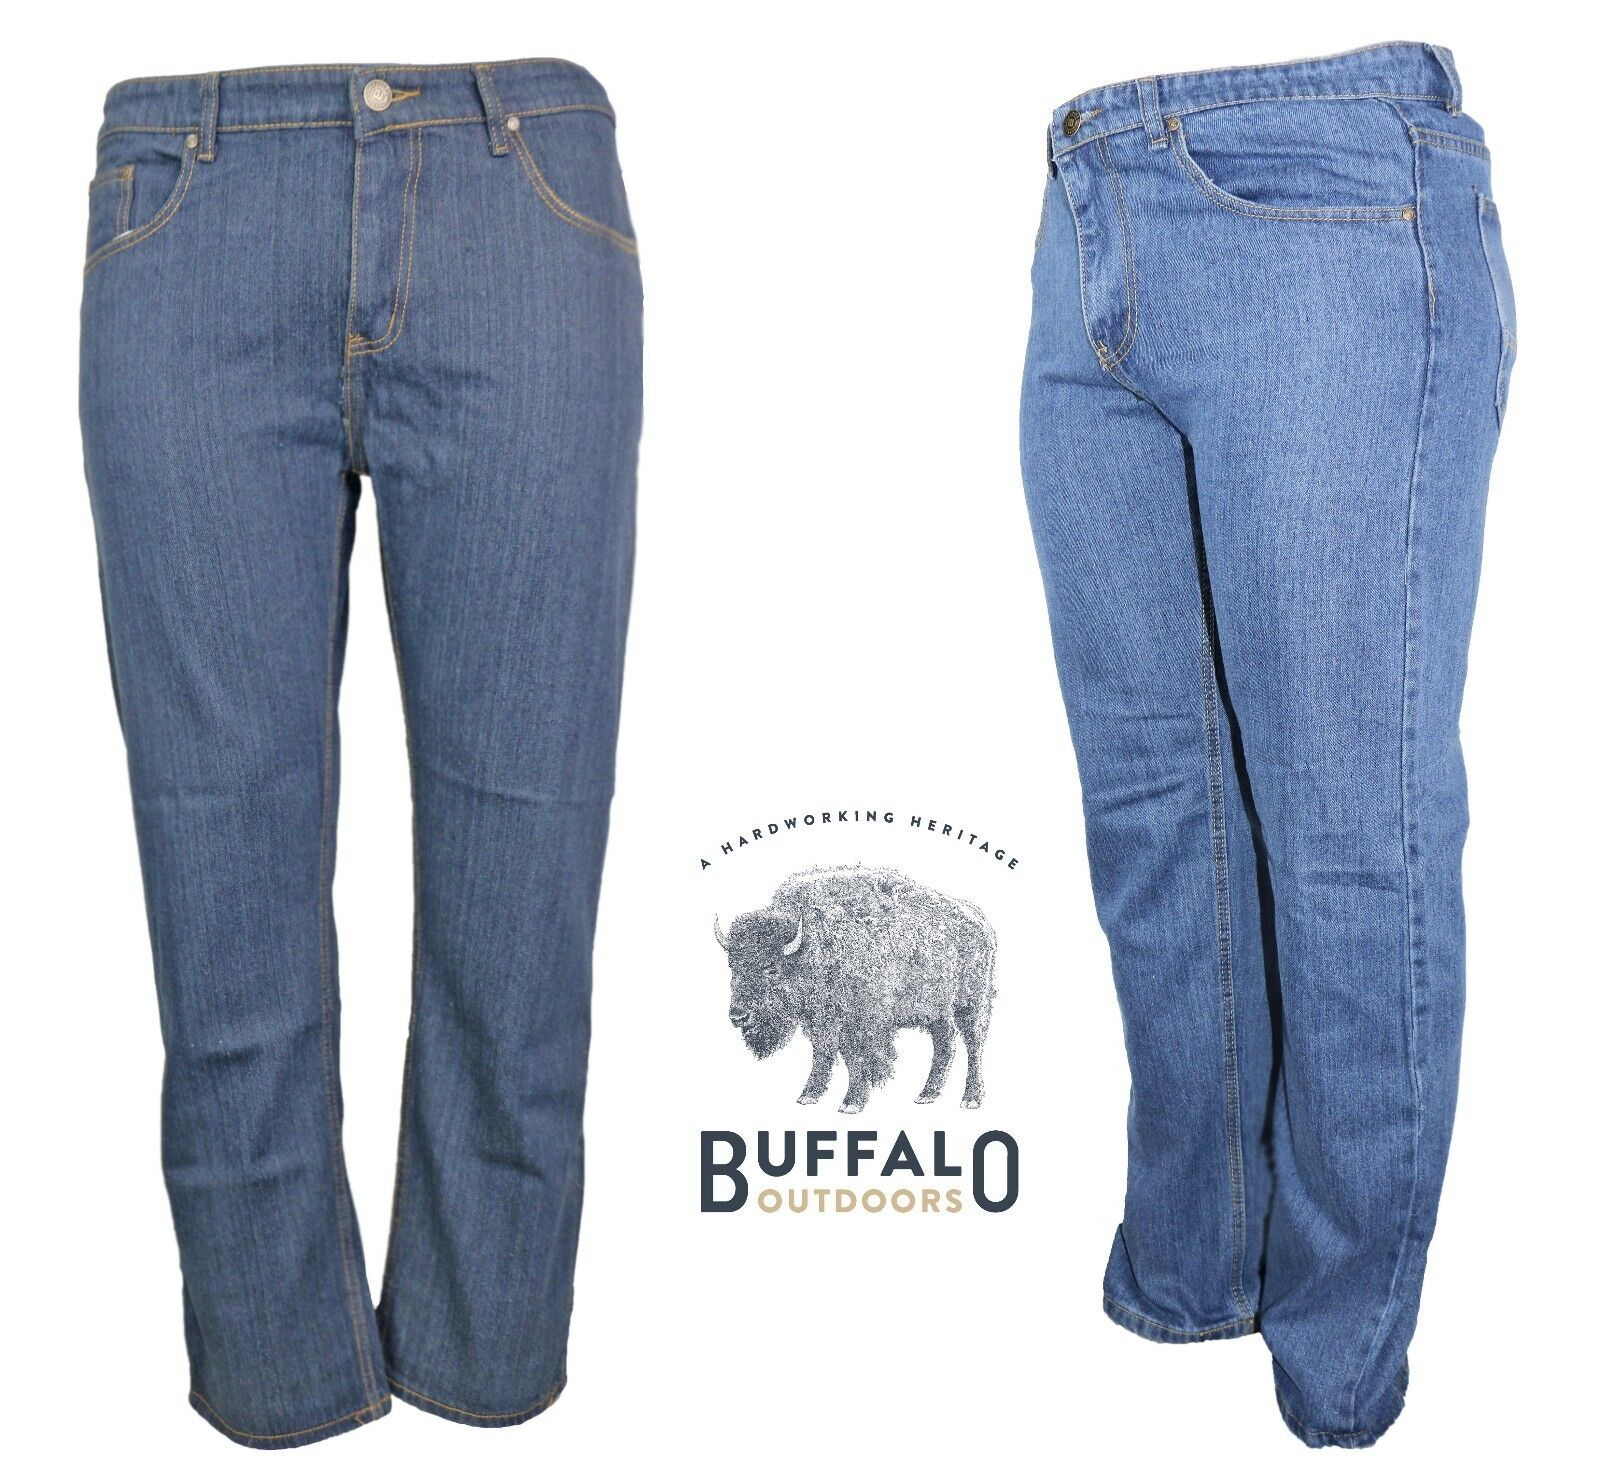 Buffalo Outdoors® Men's Relaxed Fit Work Denim 2017